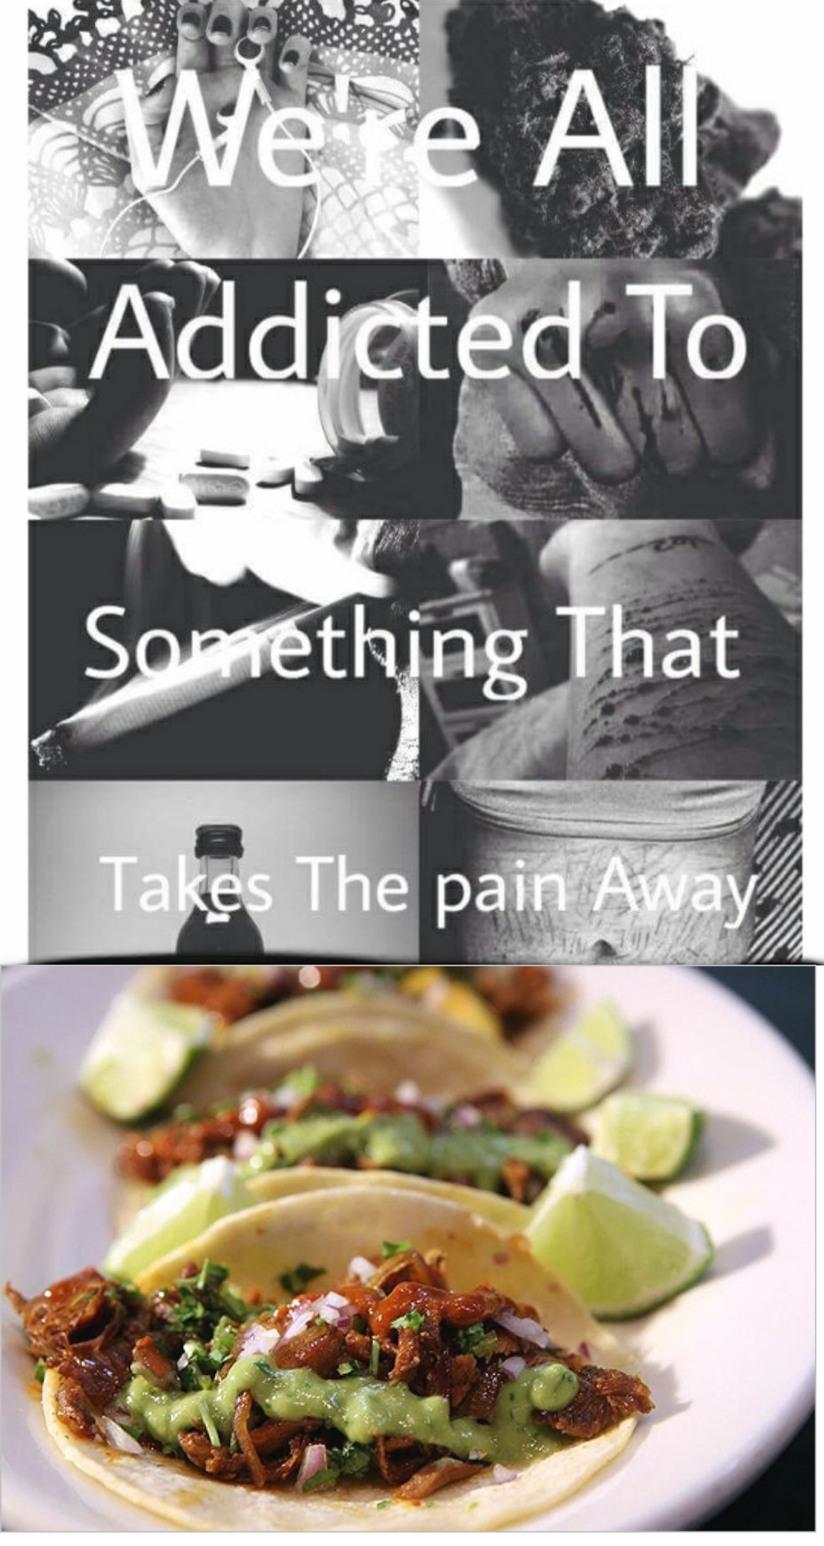 Tacos are my addiction - meme